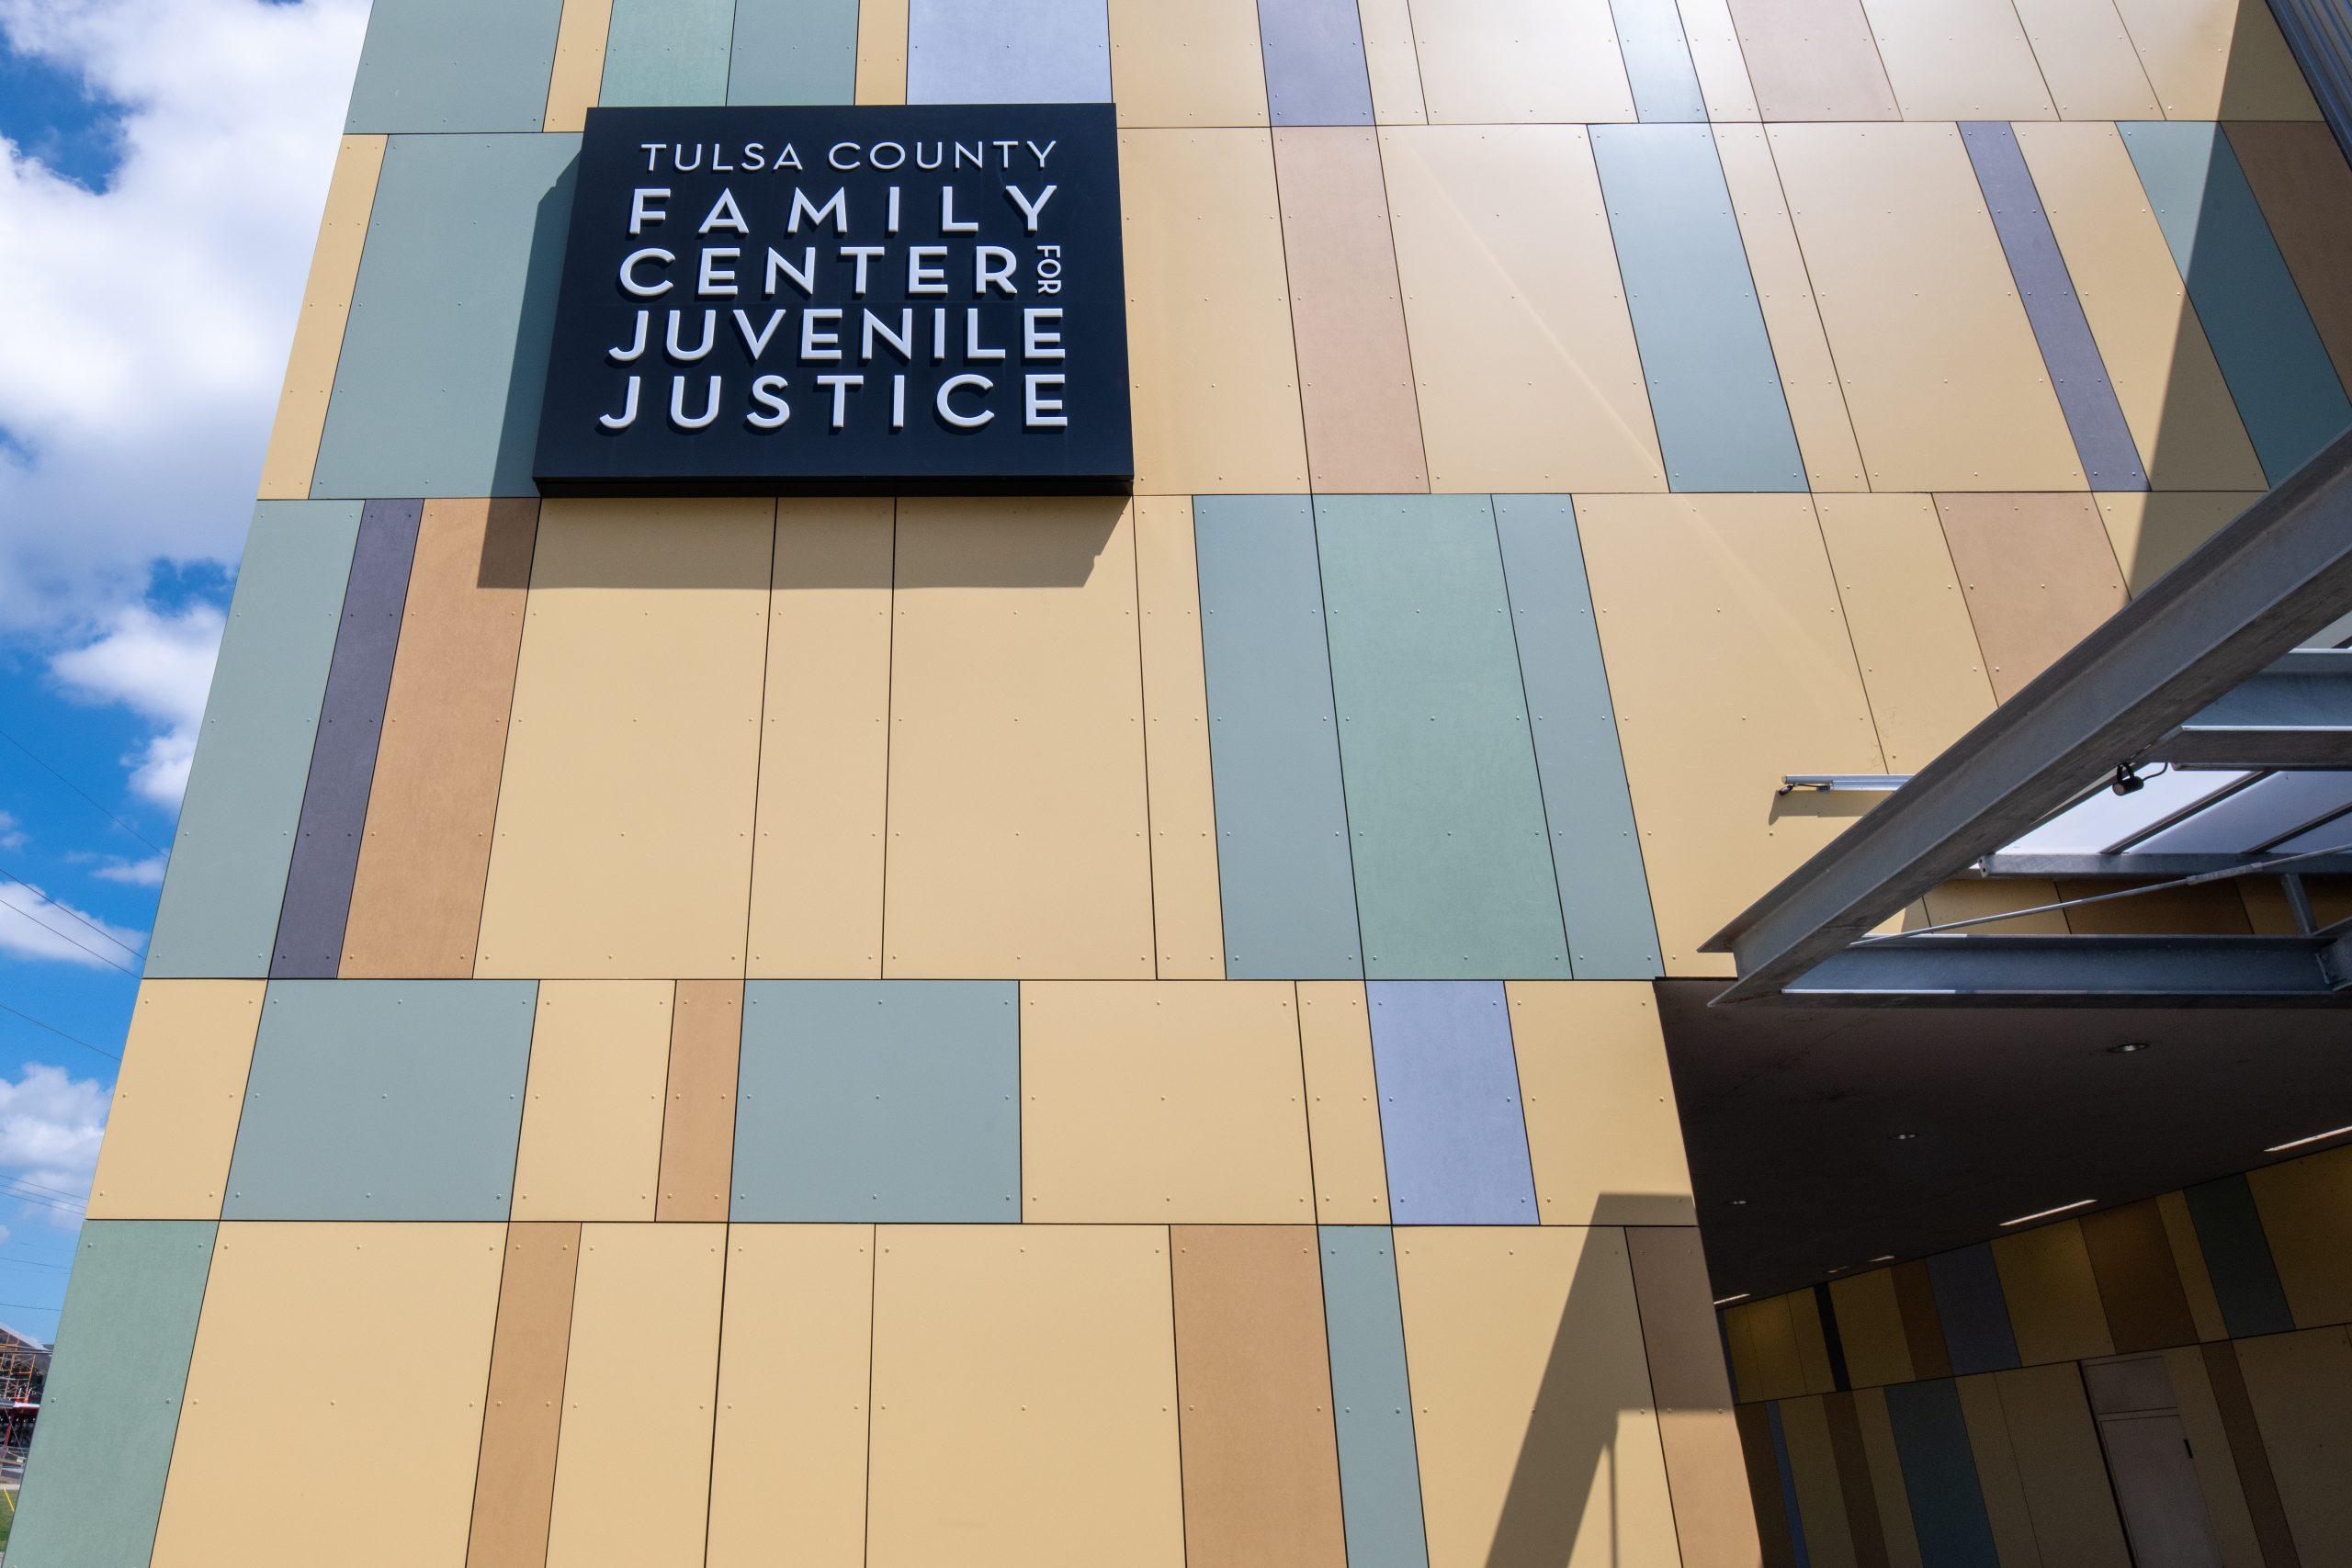 Family Juvenile Justice Building